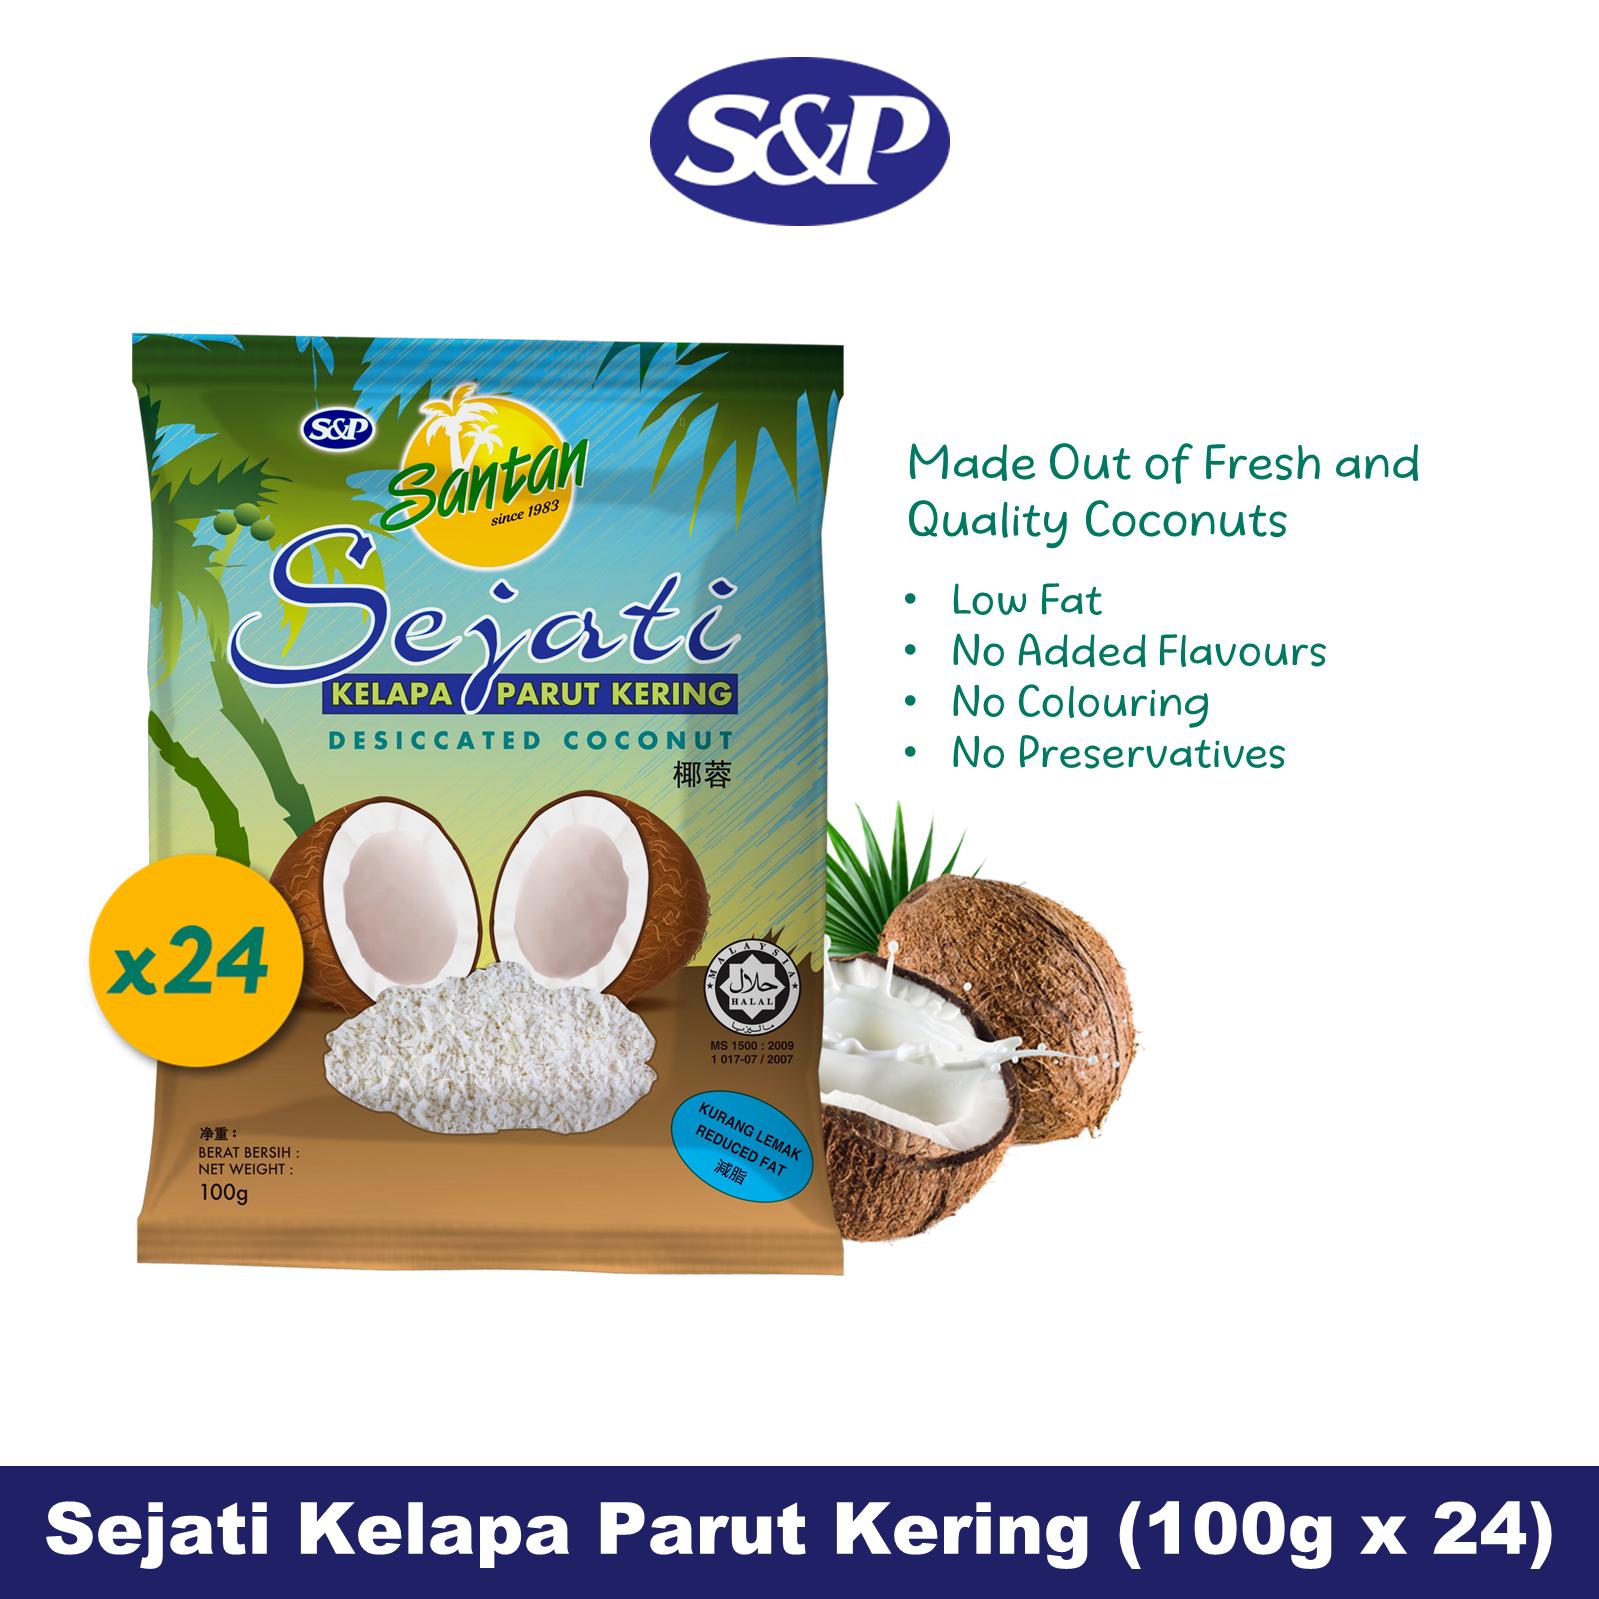 S&P Santan Sejati Desiccated Coconut Kelapa Parut Kering (100g x24)